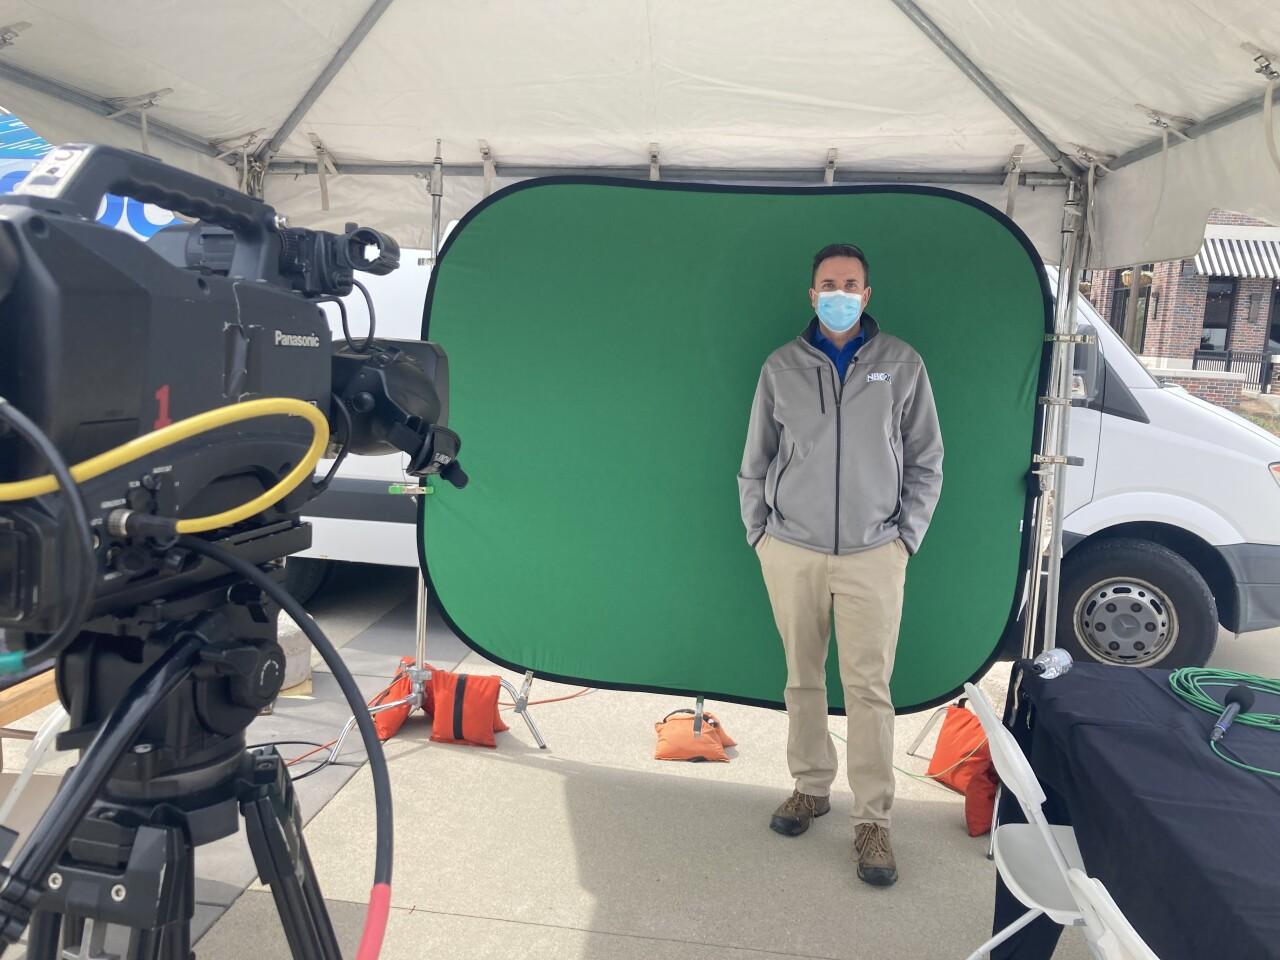 NBC 26's Chief Meteorologist Cameron Moreland